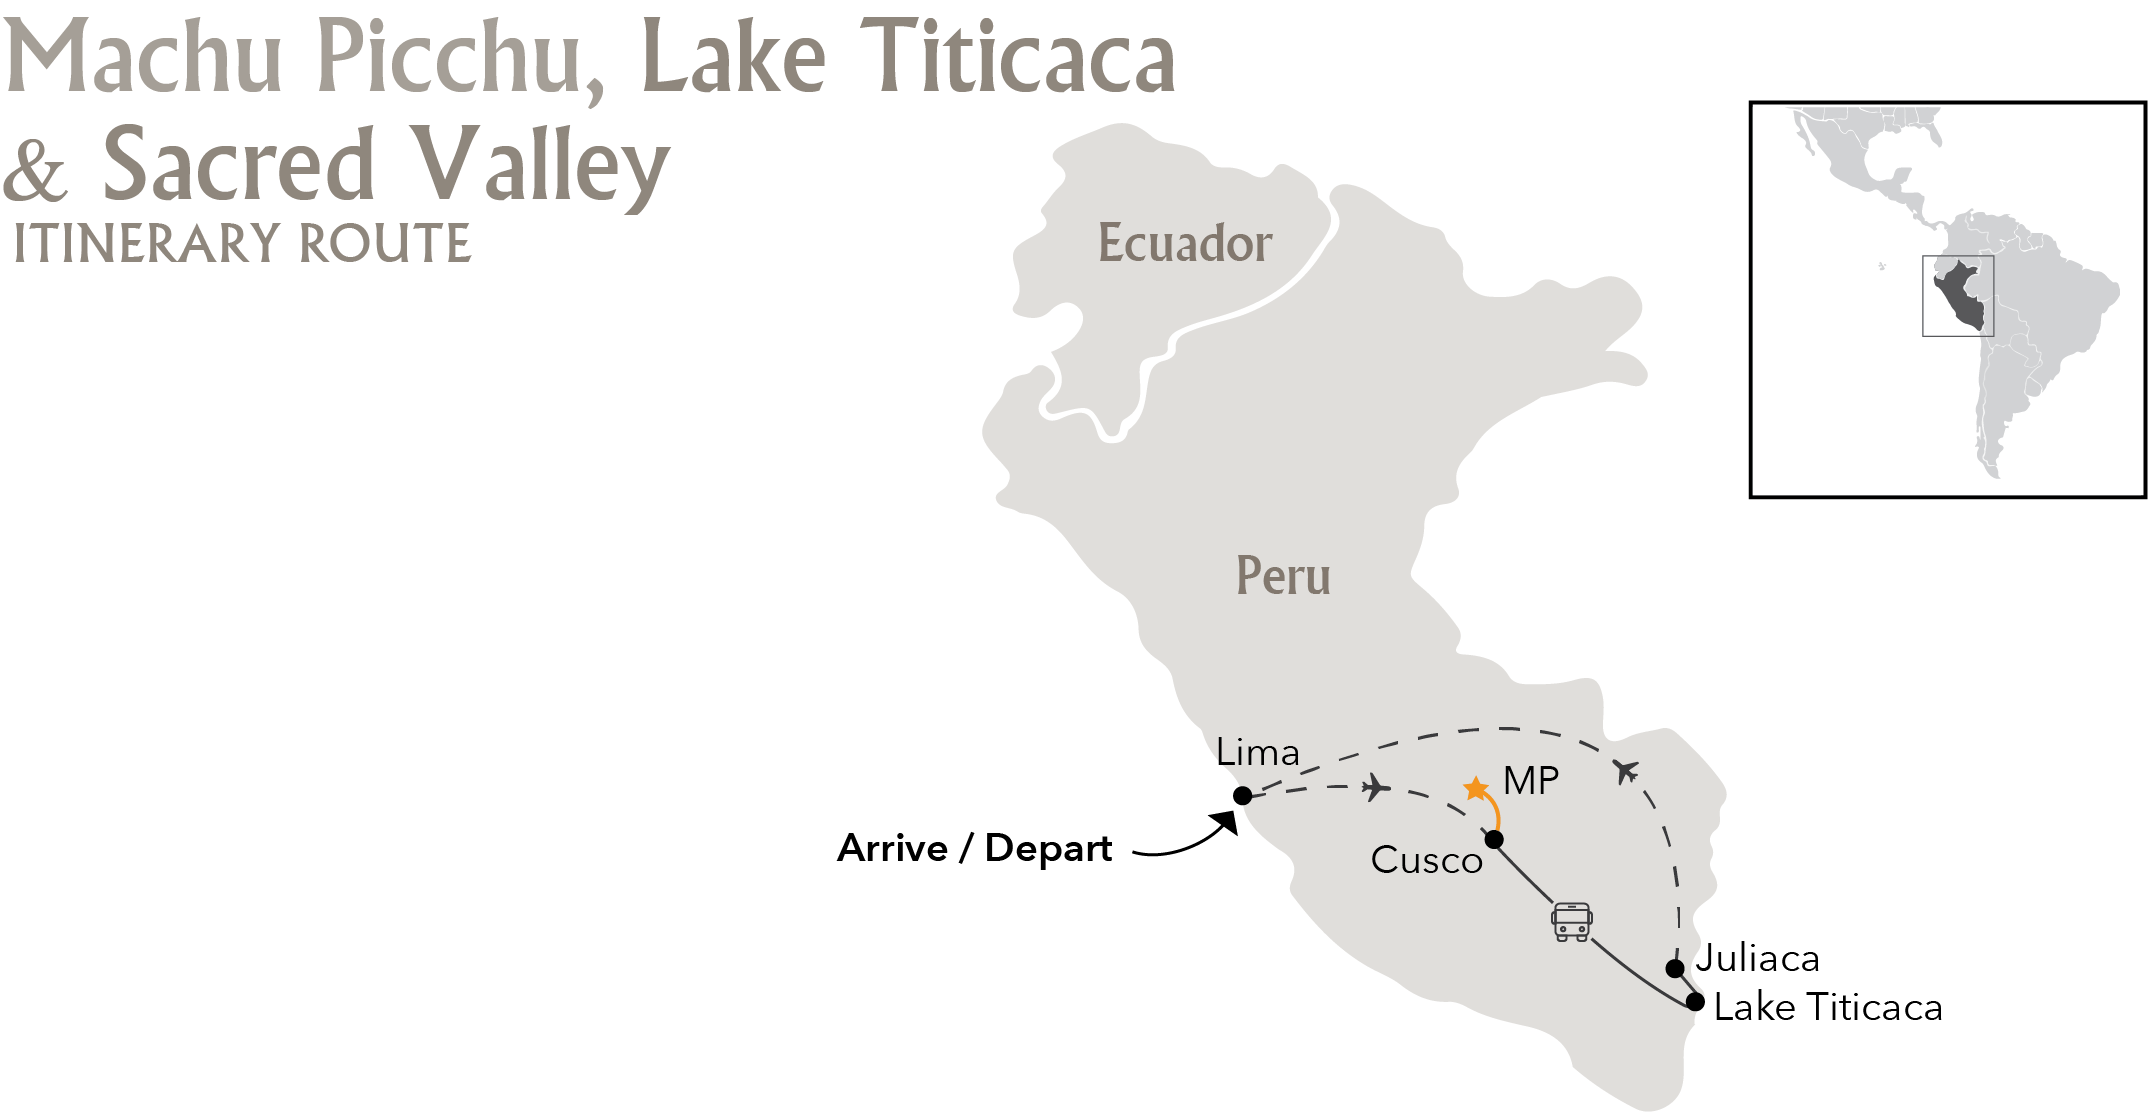 Machu Picchu, Sacred Valley & Lake Titicaca Itinerary Route